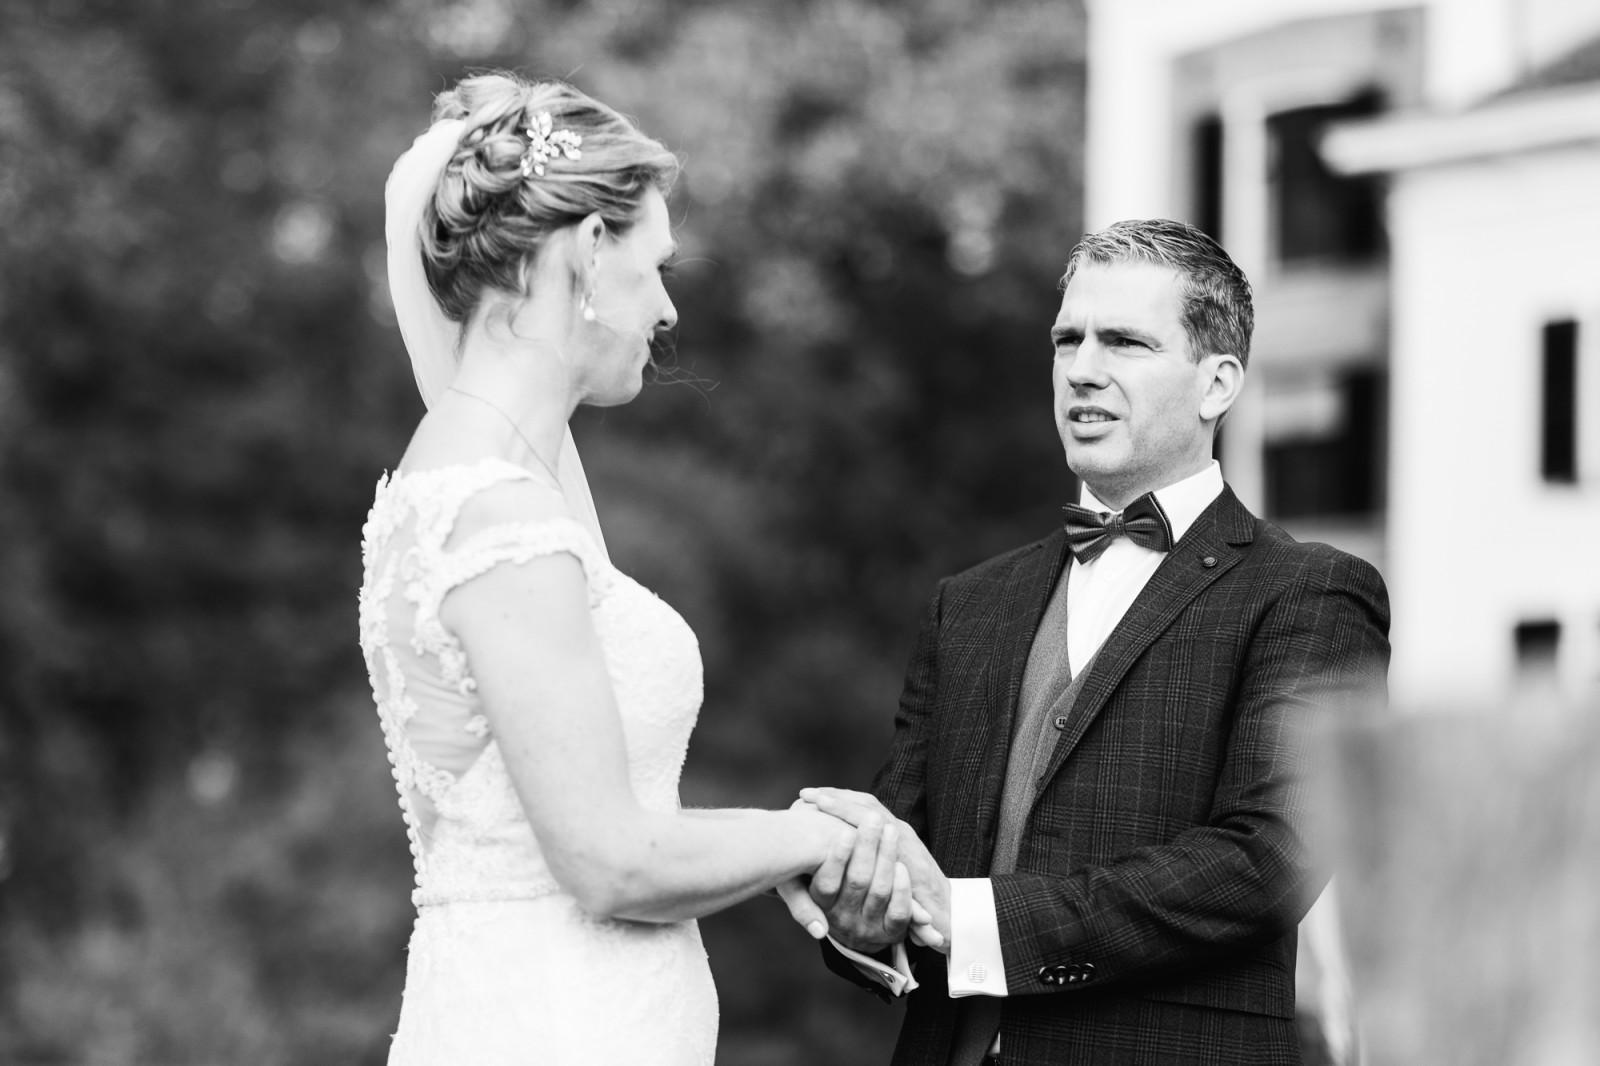 Bruidsreportage Havezate de Haere - Peter Lammers